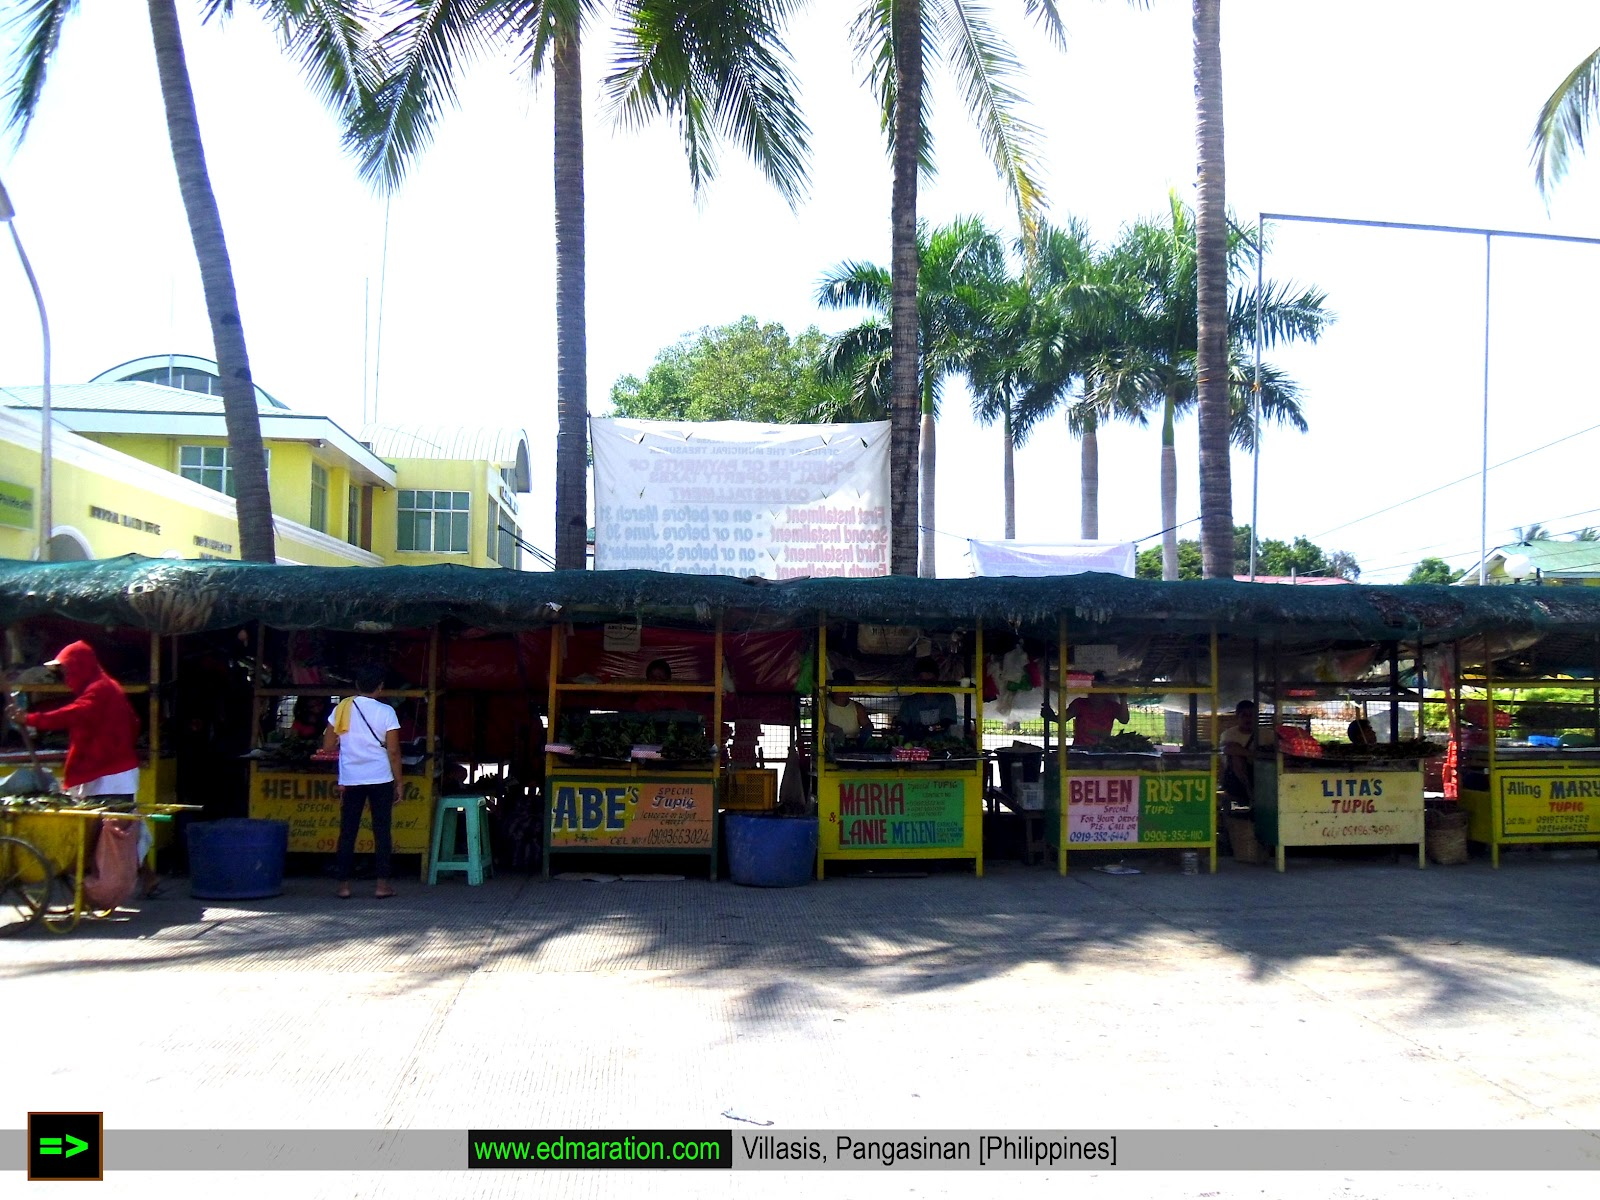 Tupig Stalls in Villasis Pangasinan